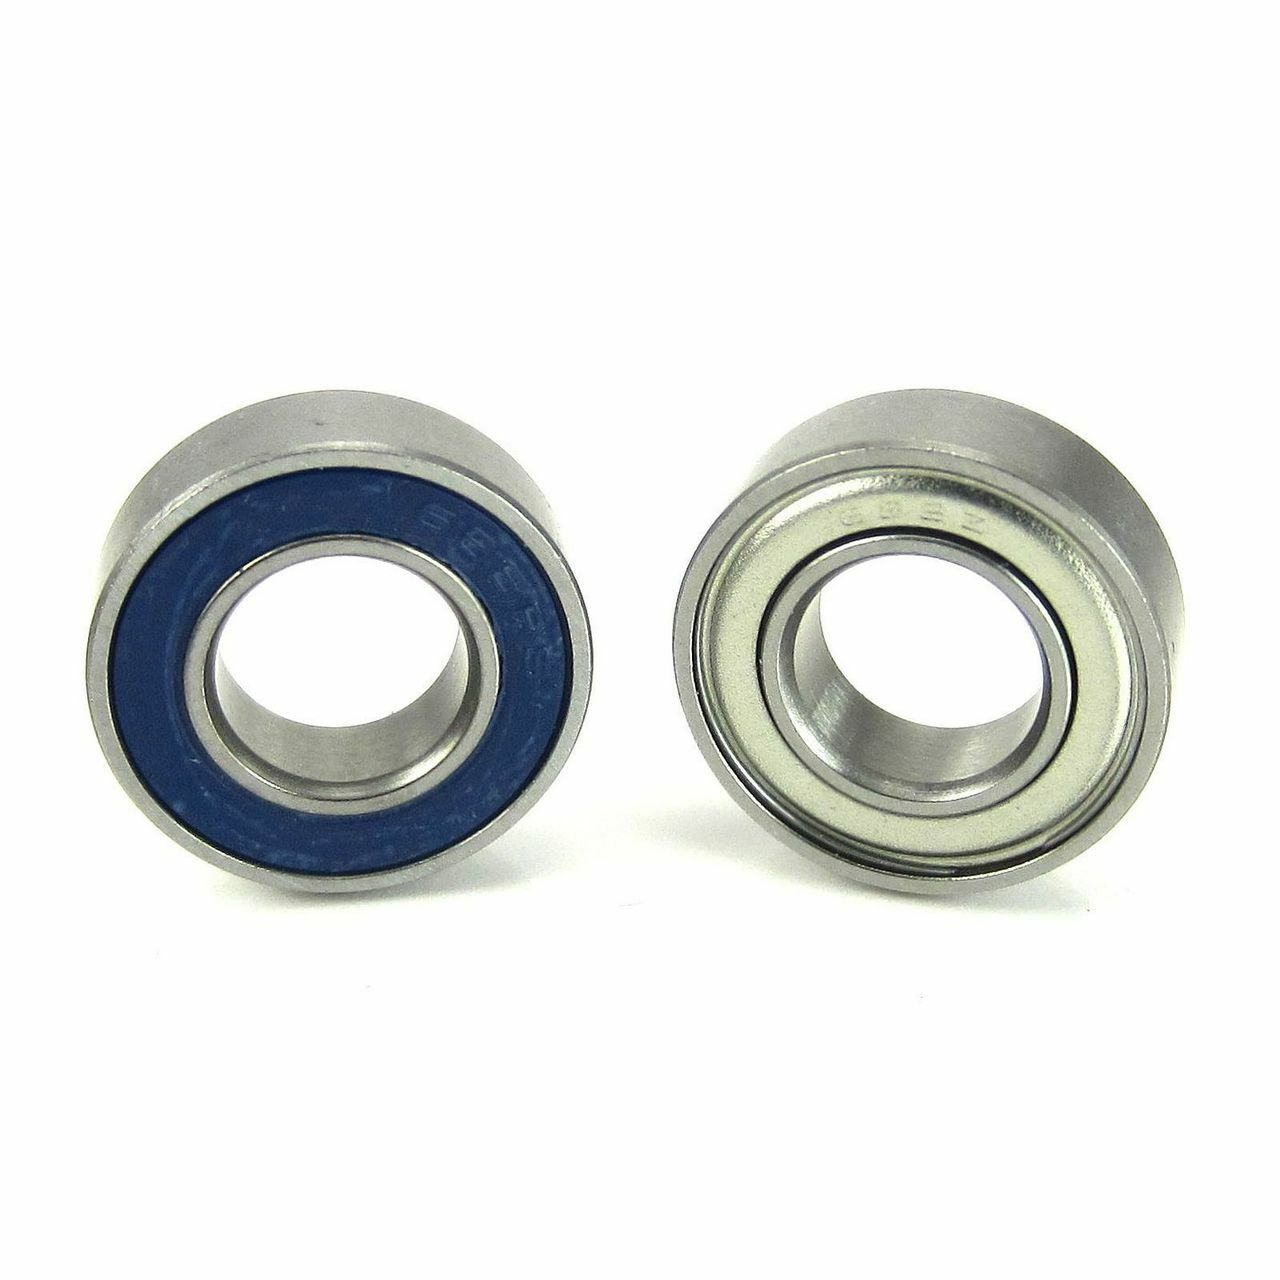 TRB RC 8x16x5mm Precision Ball Bearings ABEC 5 Hybrid Seals (2)